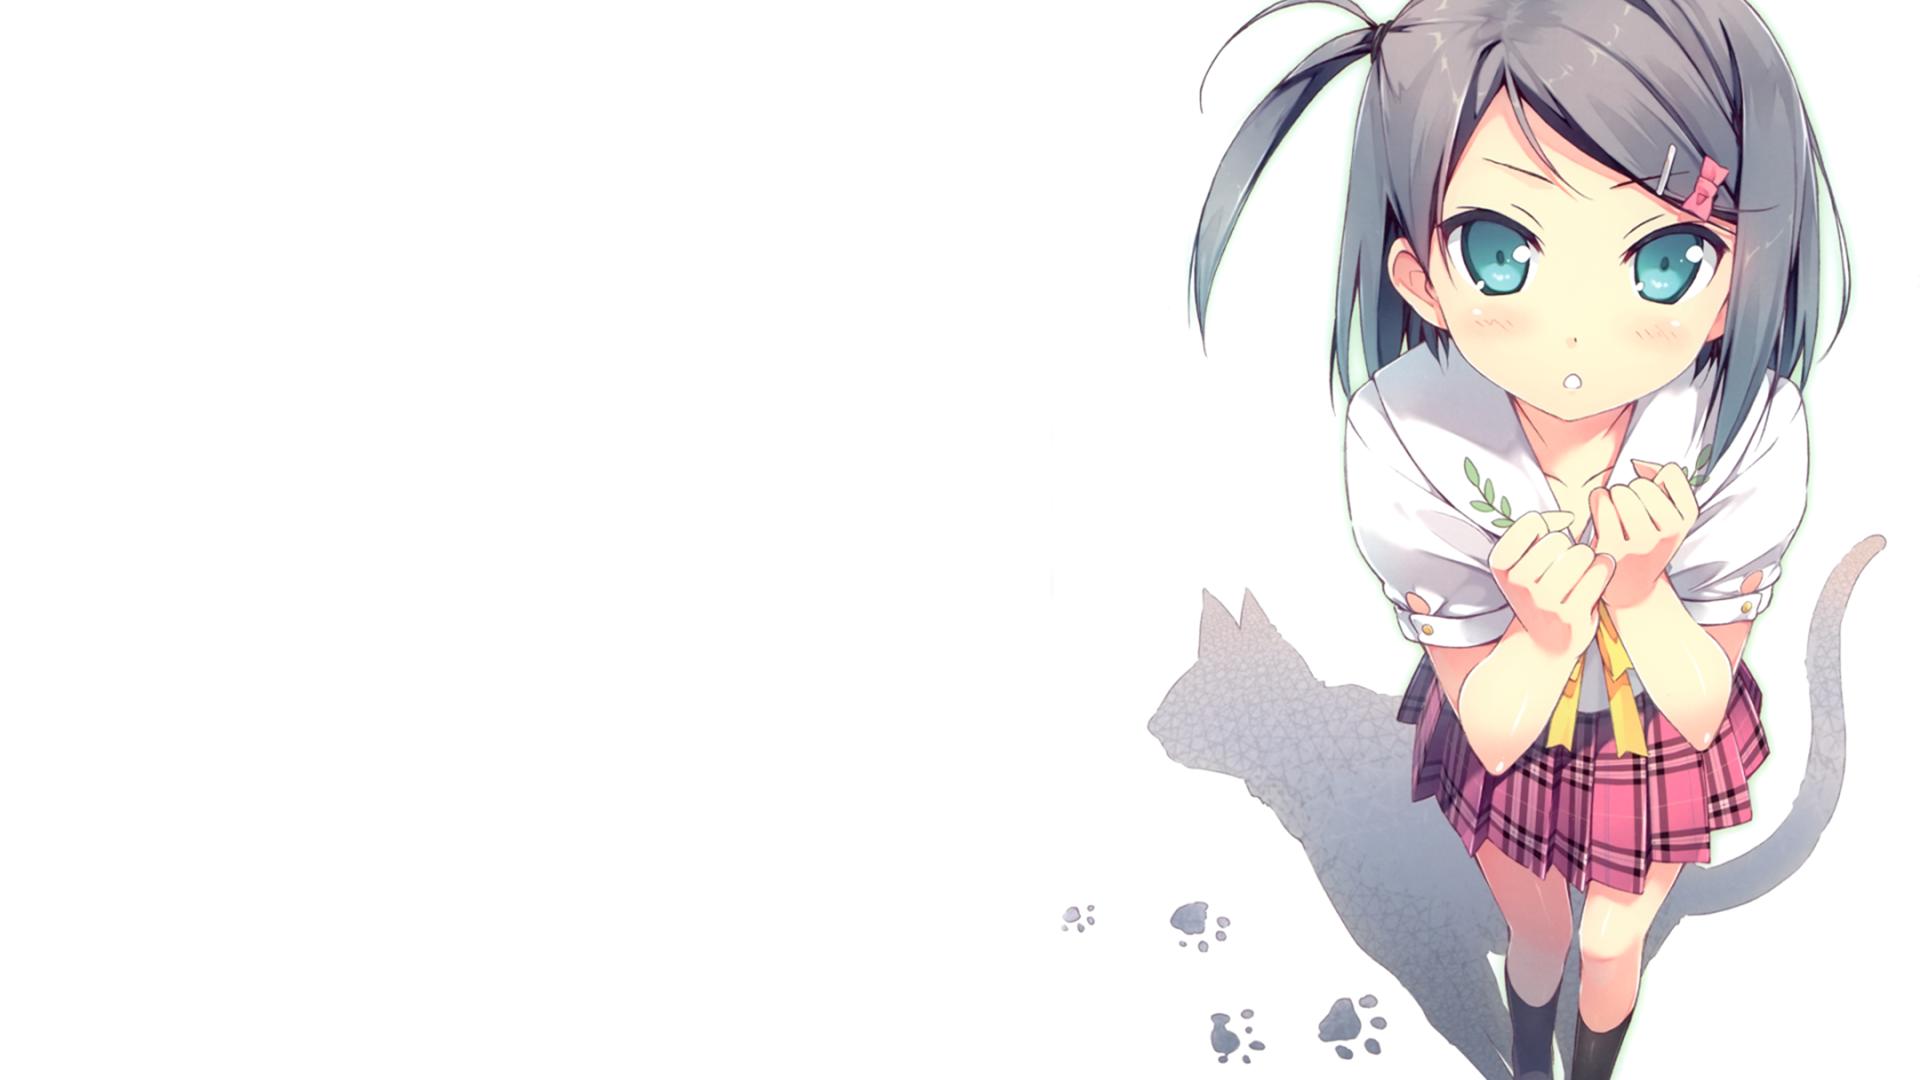 Wallpaper  Anime Girls, Black Hair, Blue Eyes, School Uniform, Hentai Ouji To -6833